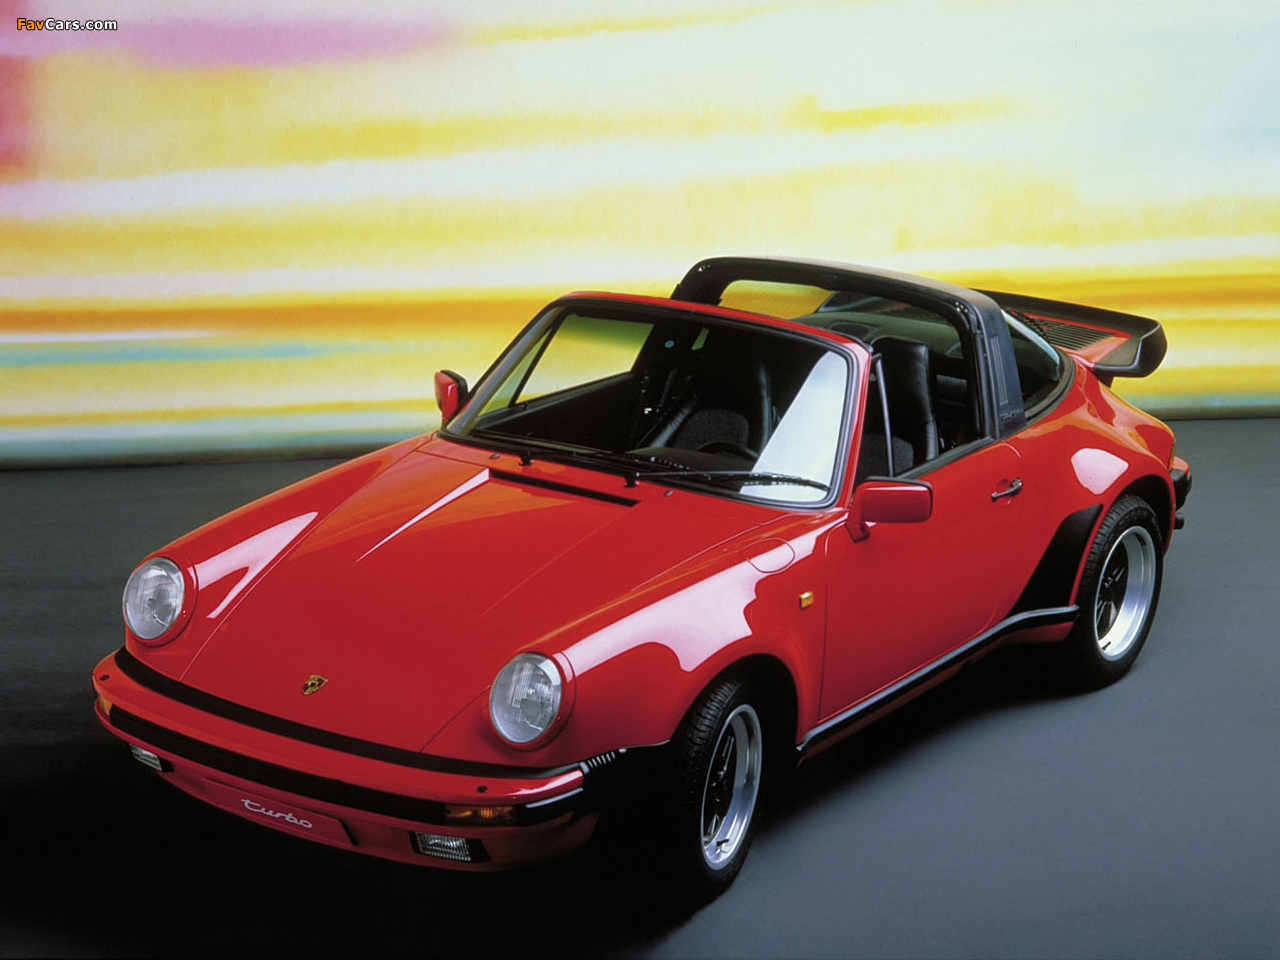 Porsche 911 Turbo 3 3 Targa 930 1987 89 Wallpapers 1280x960